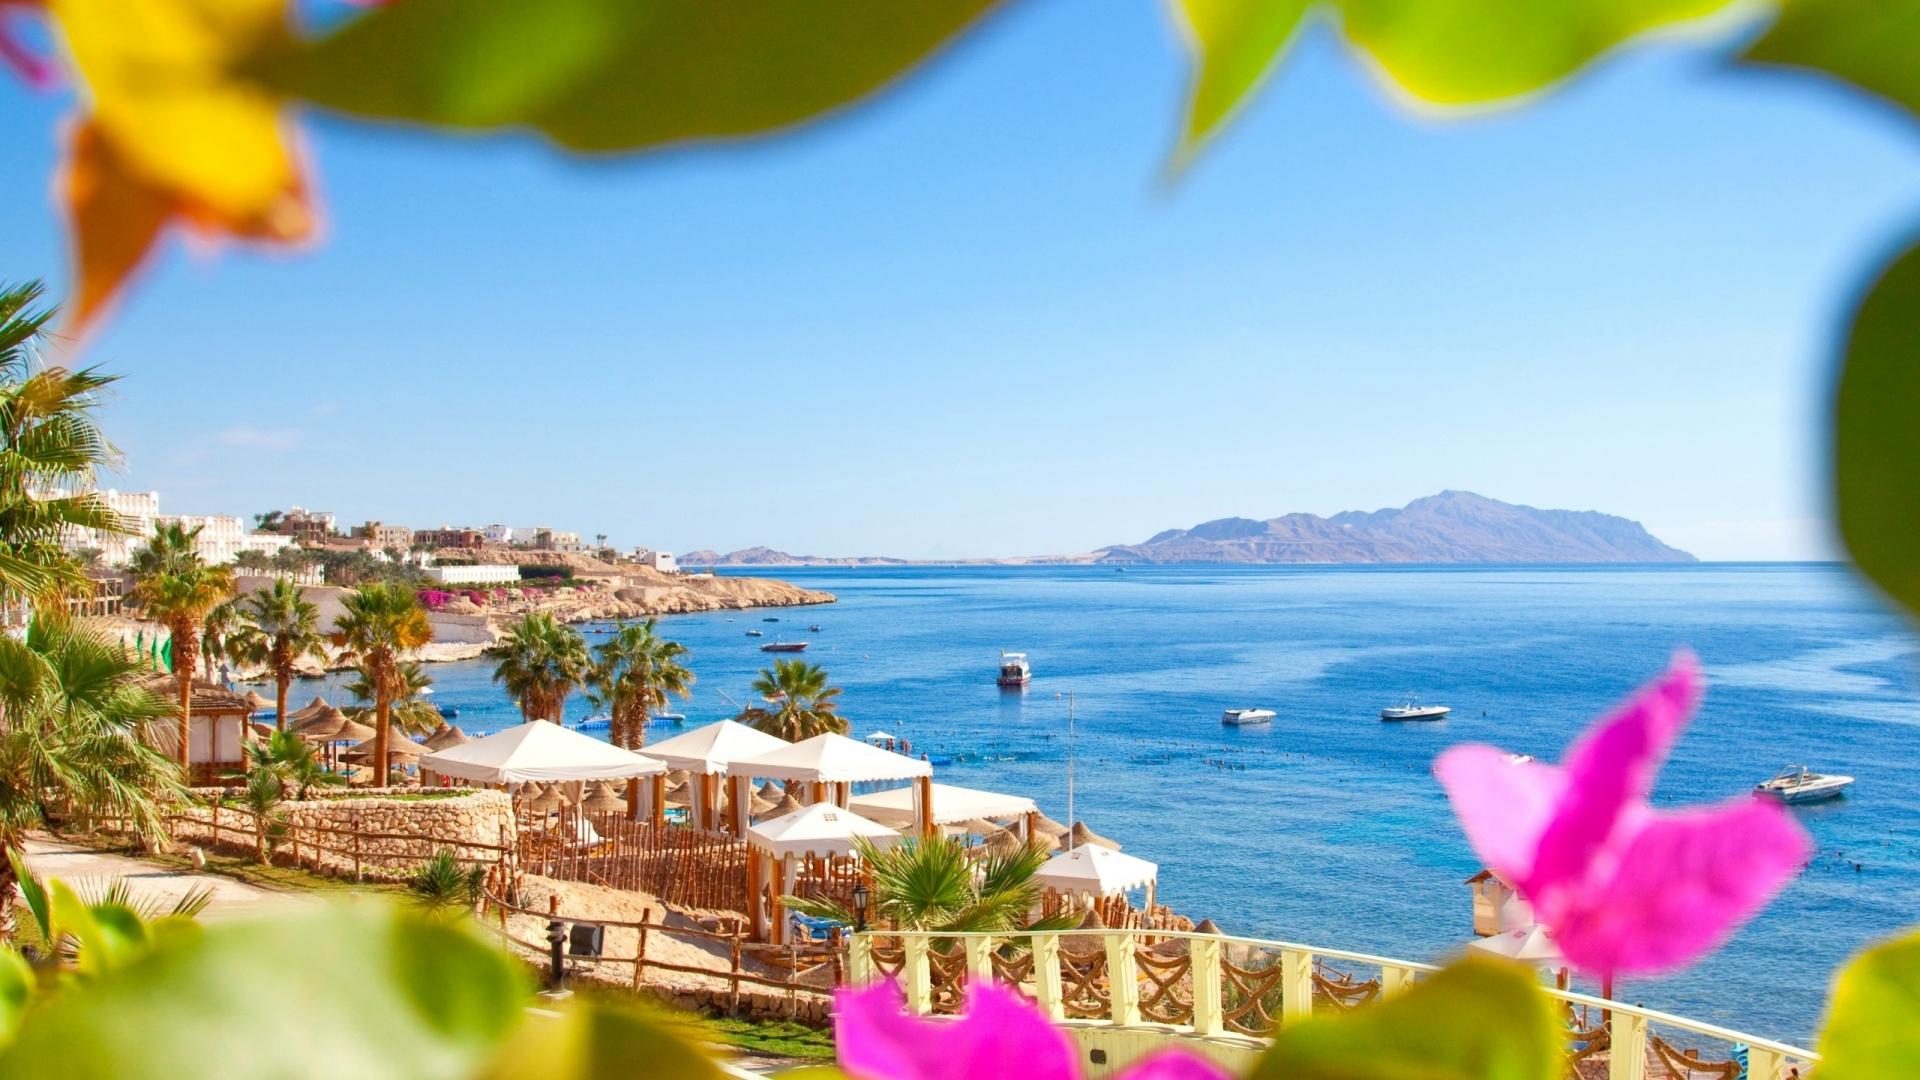 Bugatti Hd Wallpapers Free Download Beautiful Landscape From Egypt Beach Resort